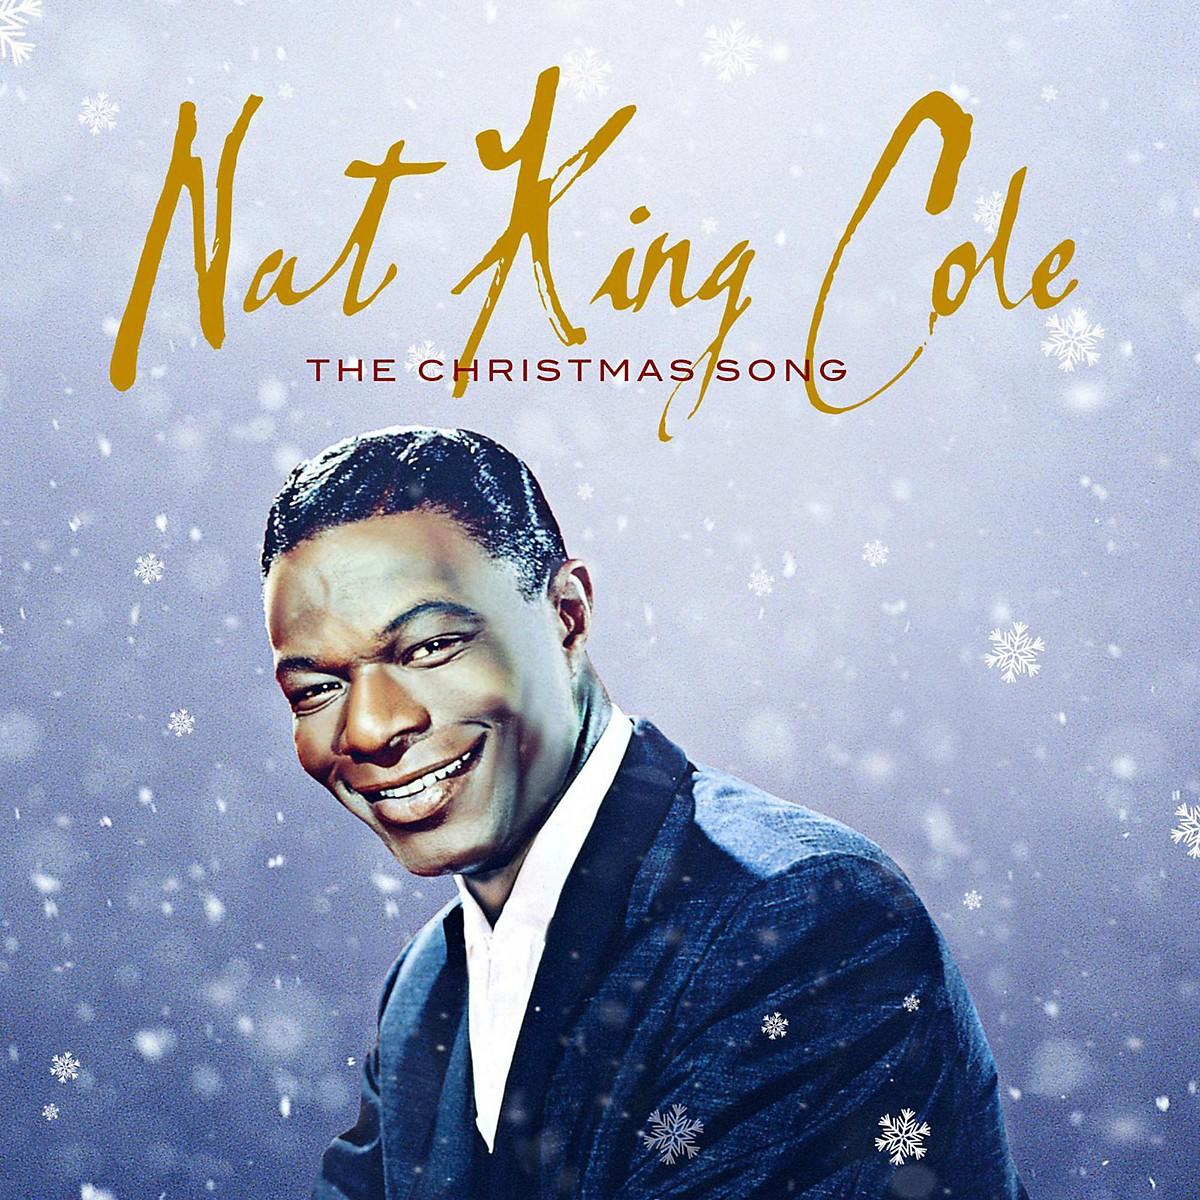 Universal Music Group Nat King Cole - The Christmas Song CD